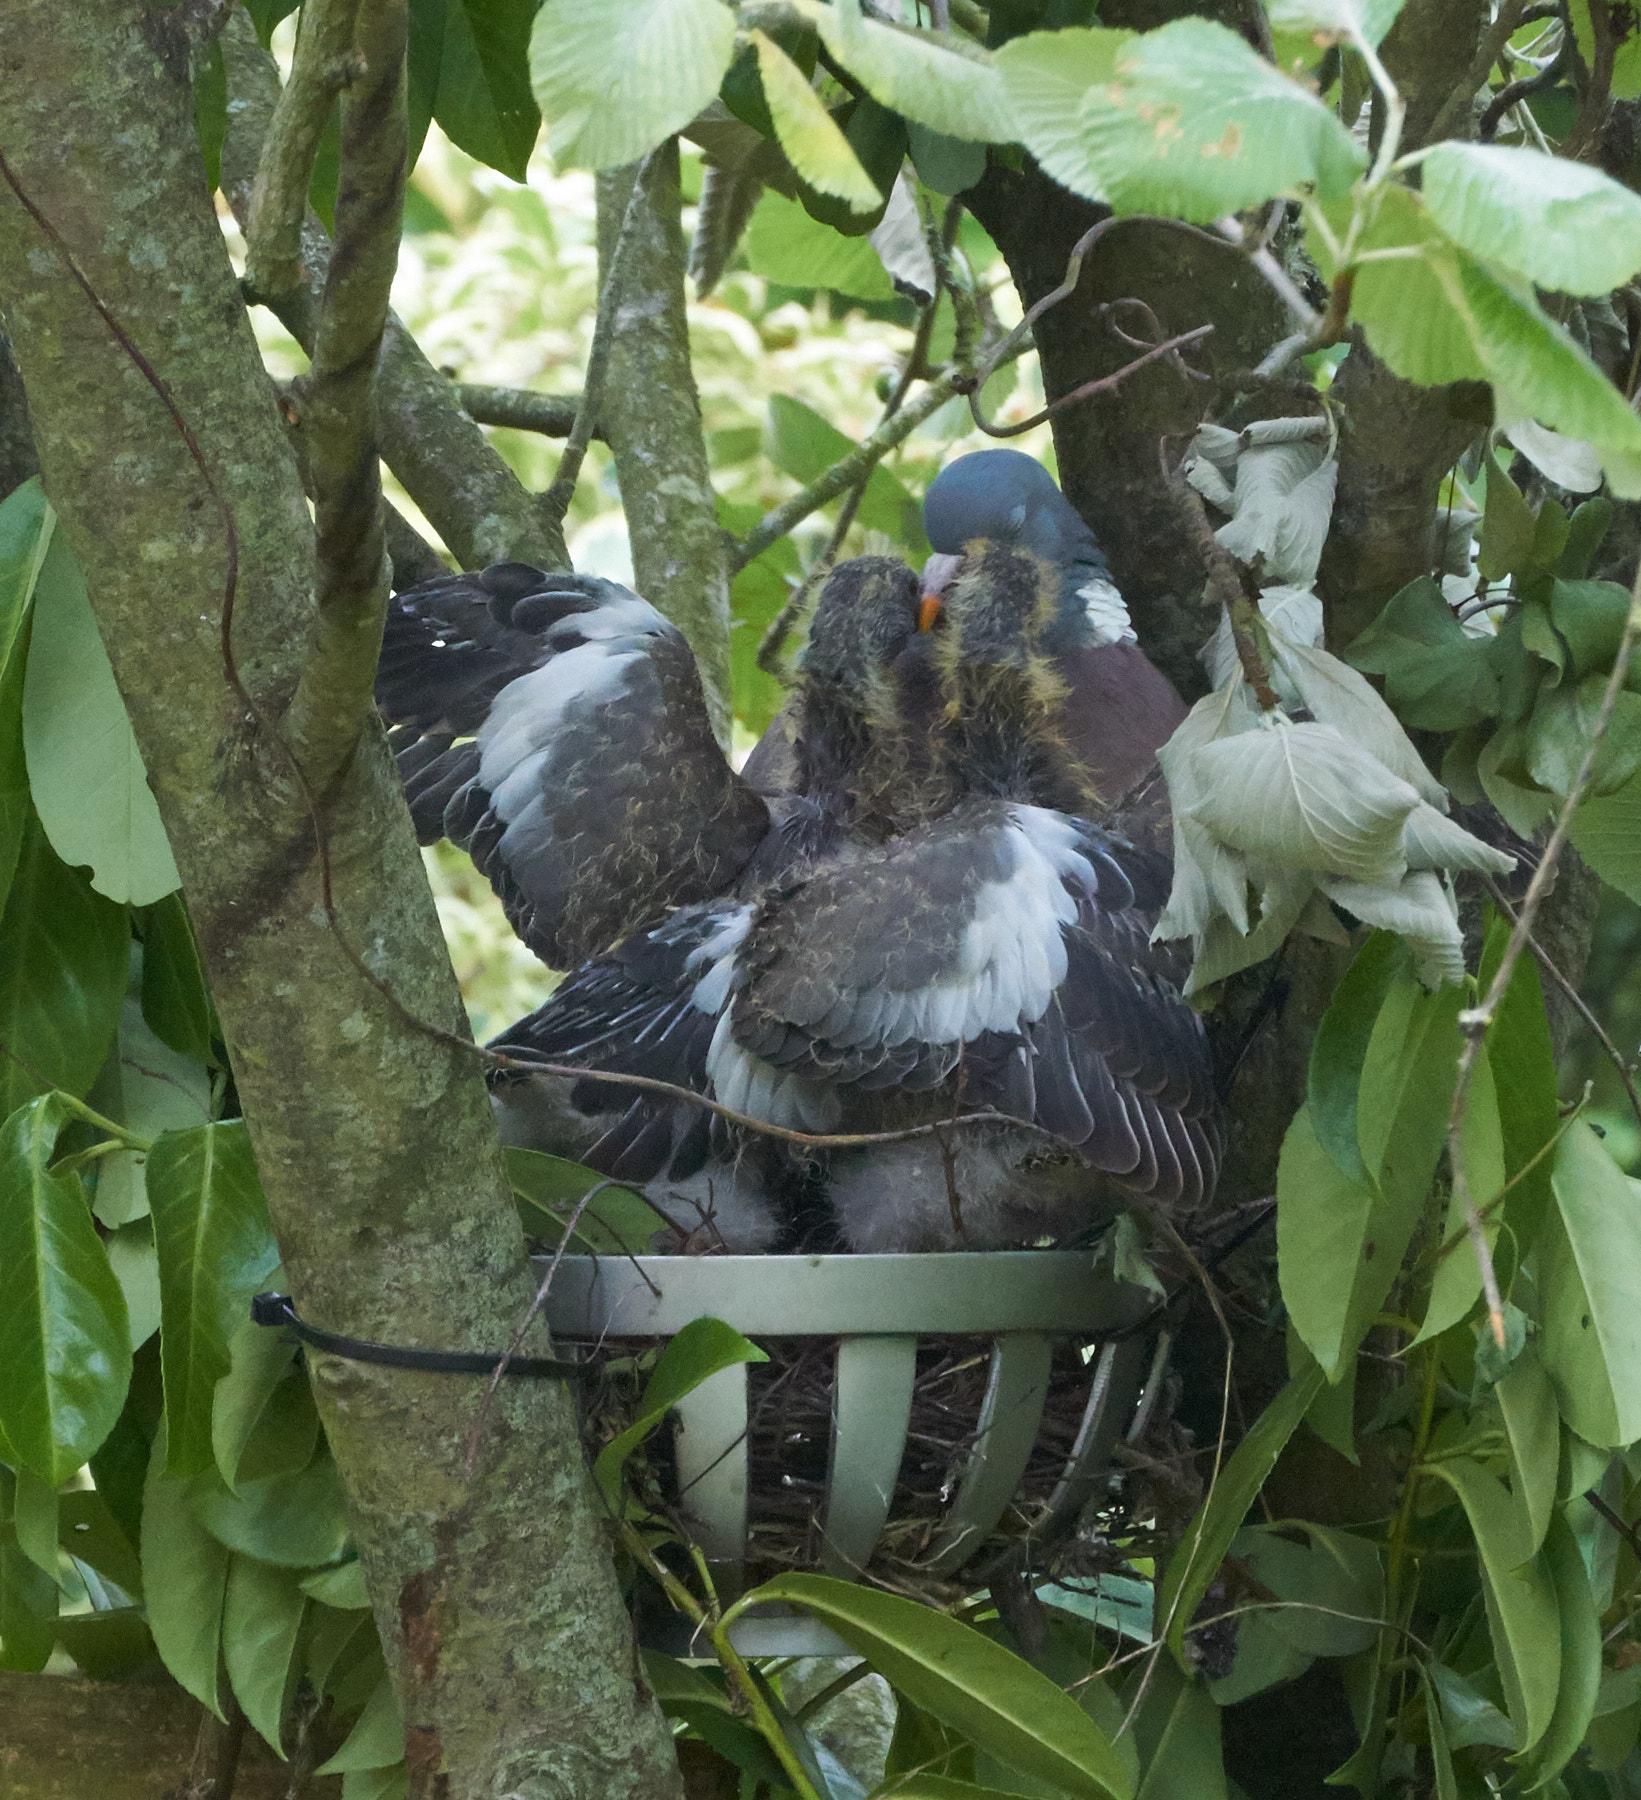 Wood-Pidgeon-Chick-Rescue-20170625-1.jpg